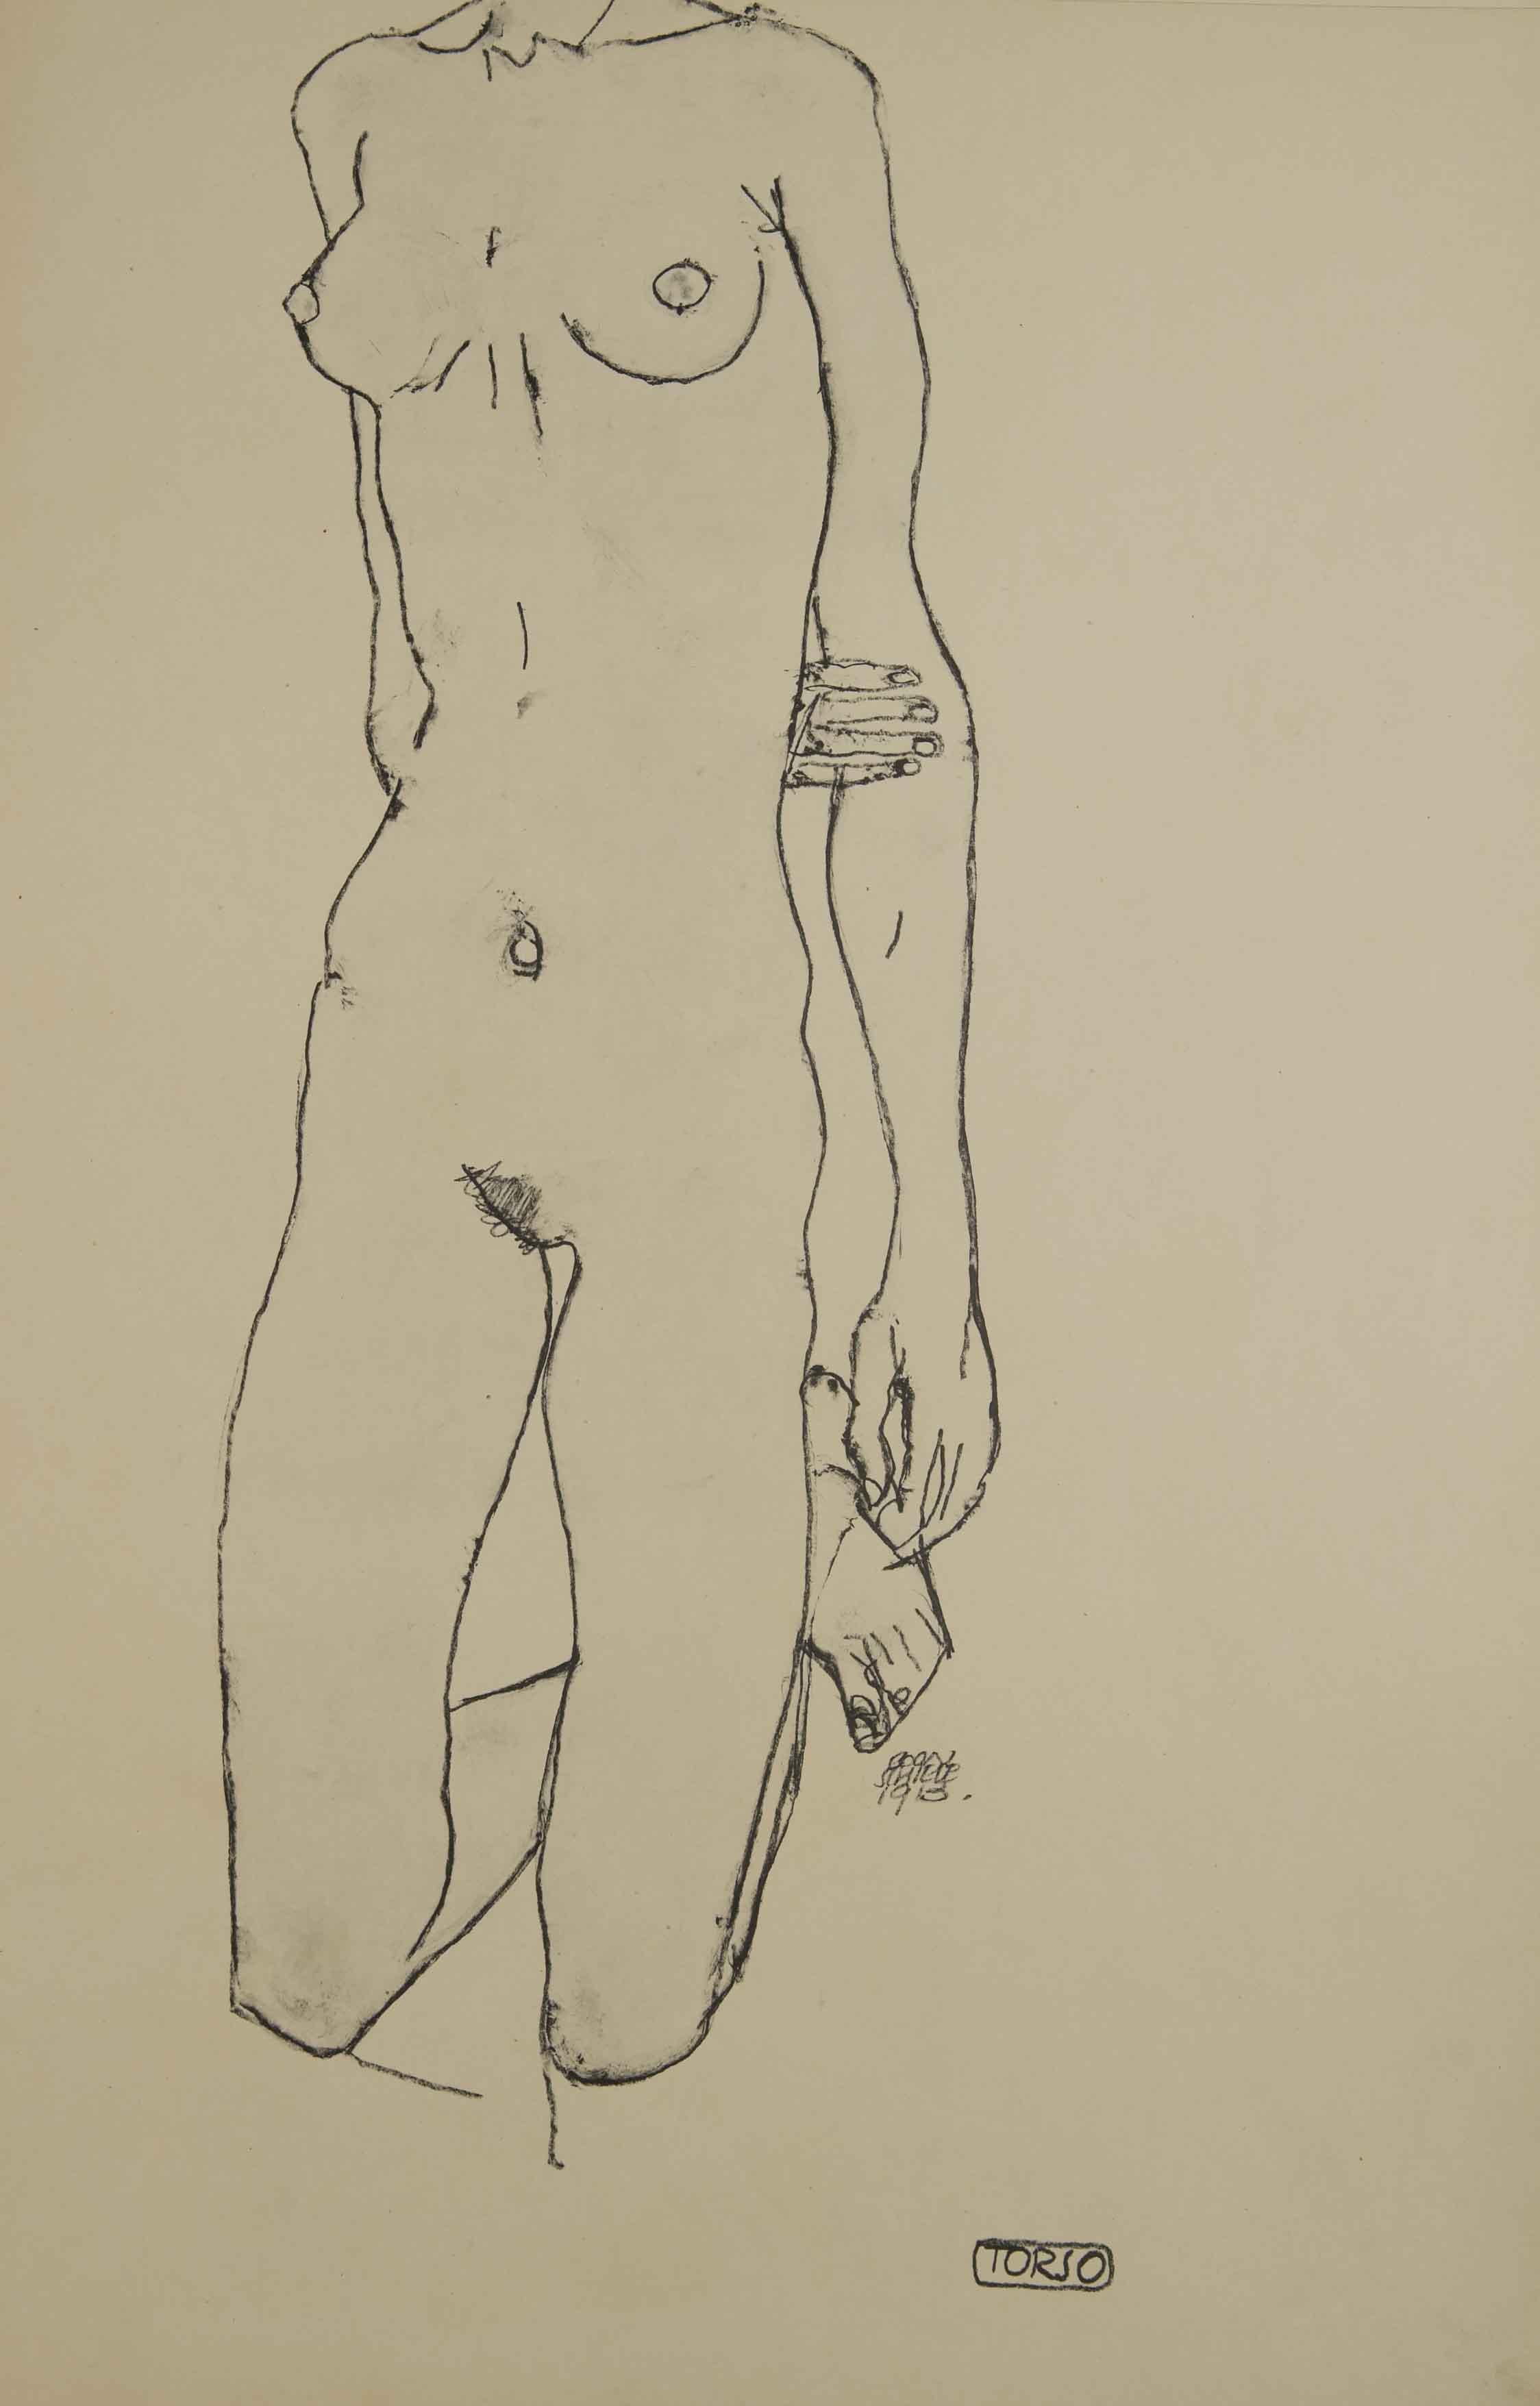 Egon Schiele -Torso, From the portfolio Zeichnungen (drawings),191 incluing 12 Heliotypes, Ed° Librairie Richard Lanyi,Vienne, 1917.